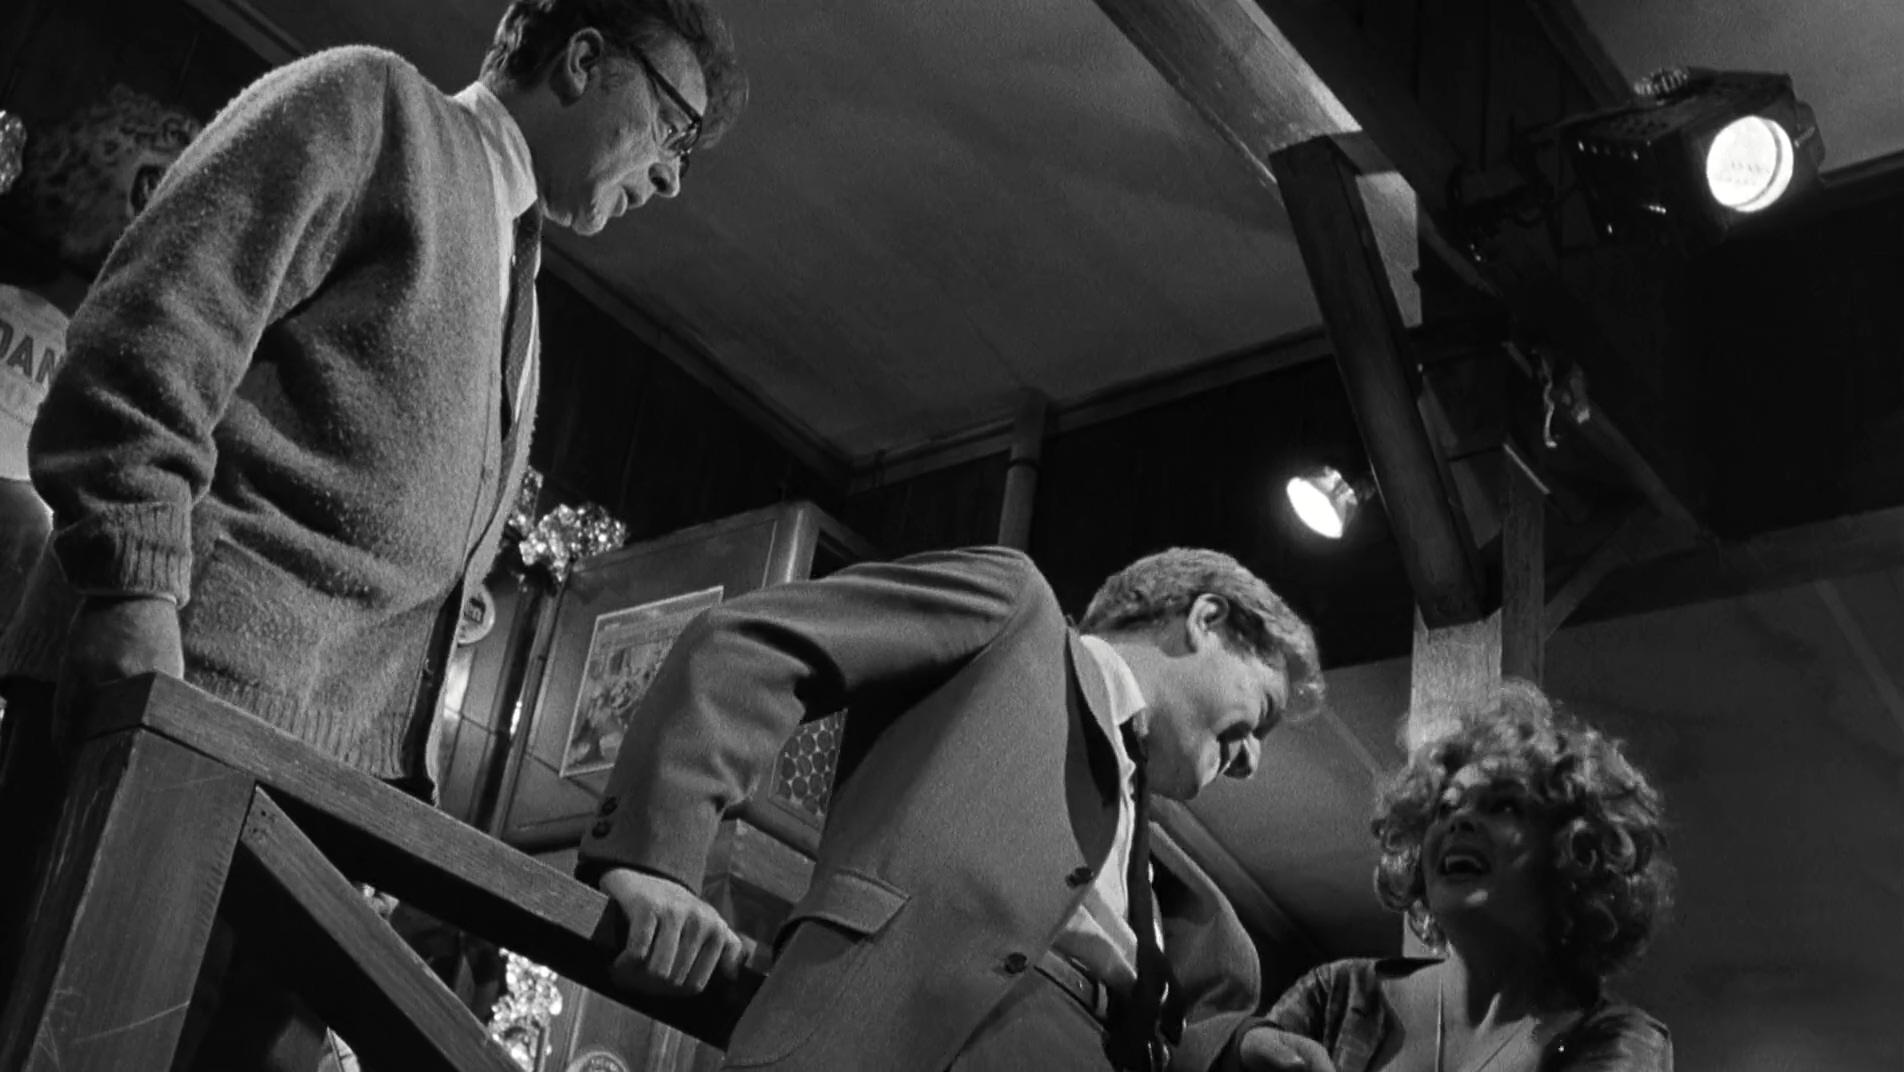 Richard Burton, Elizabeth Taylor, and George Segal in Who's Afraid of Virginia Woolf? (1966)